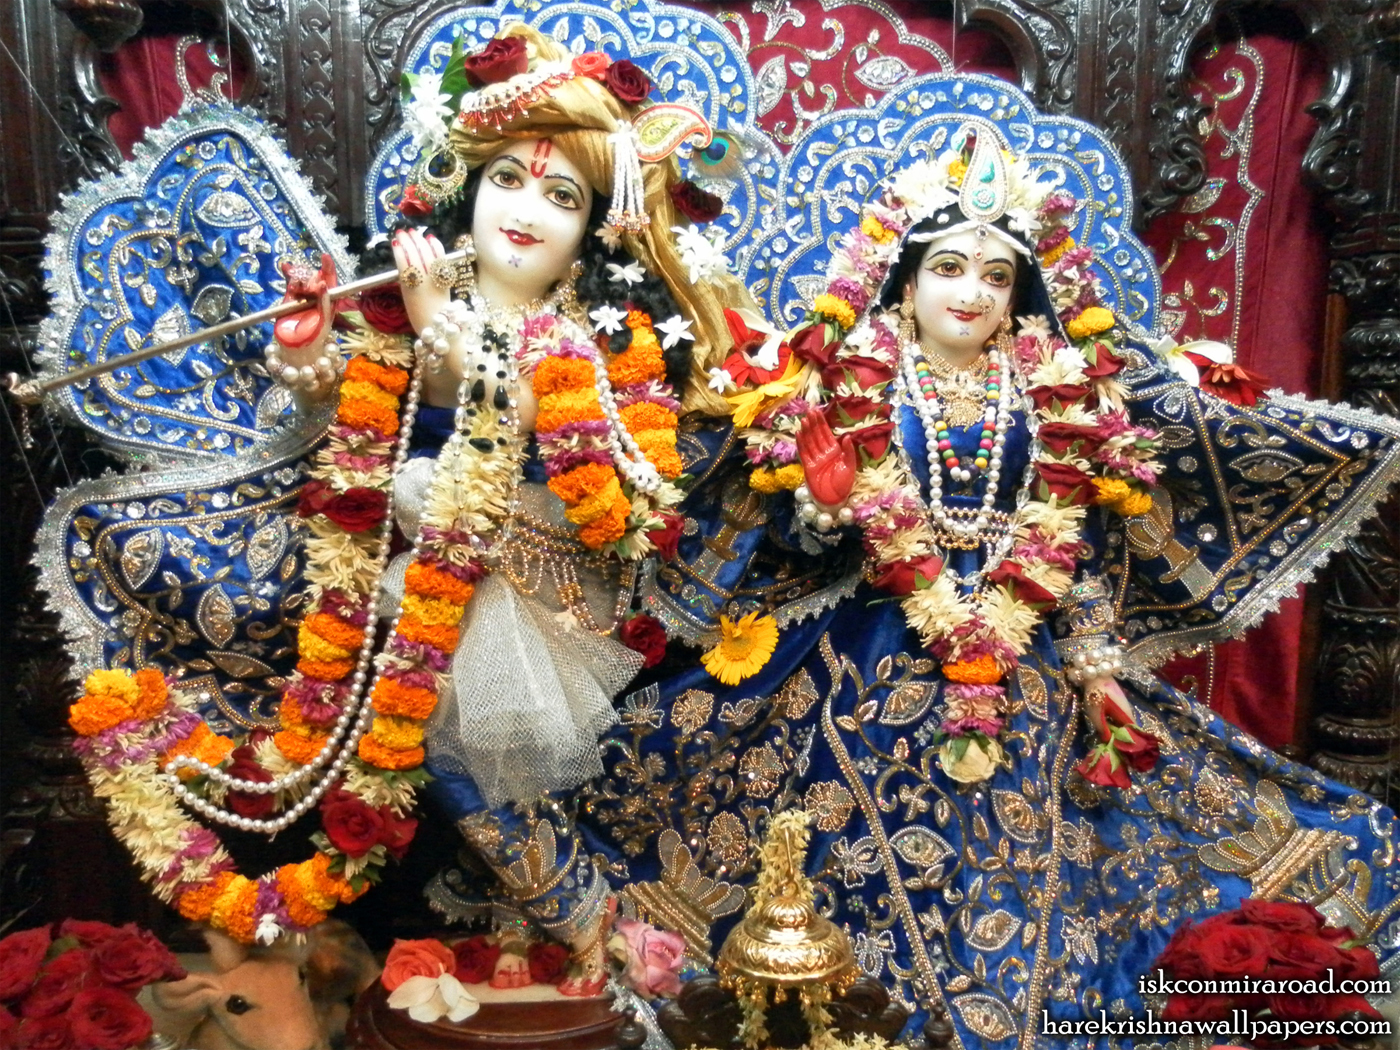 Sri Sri Radha Giridhari Wallpaper (008) Size 1400x1050 Download